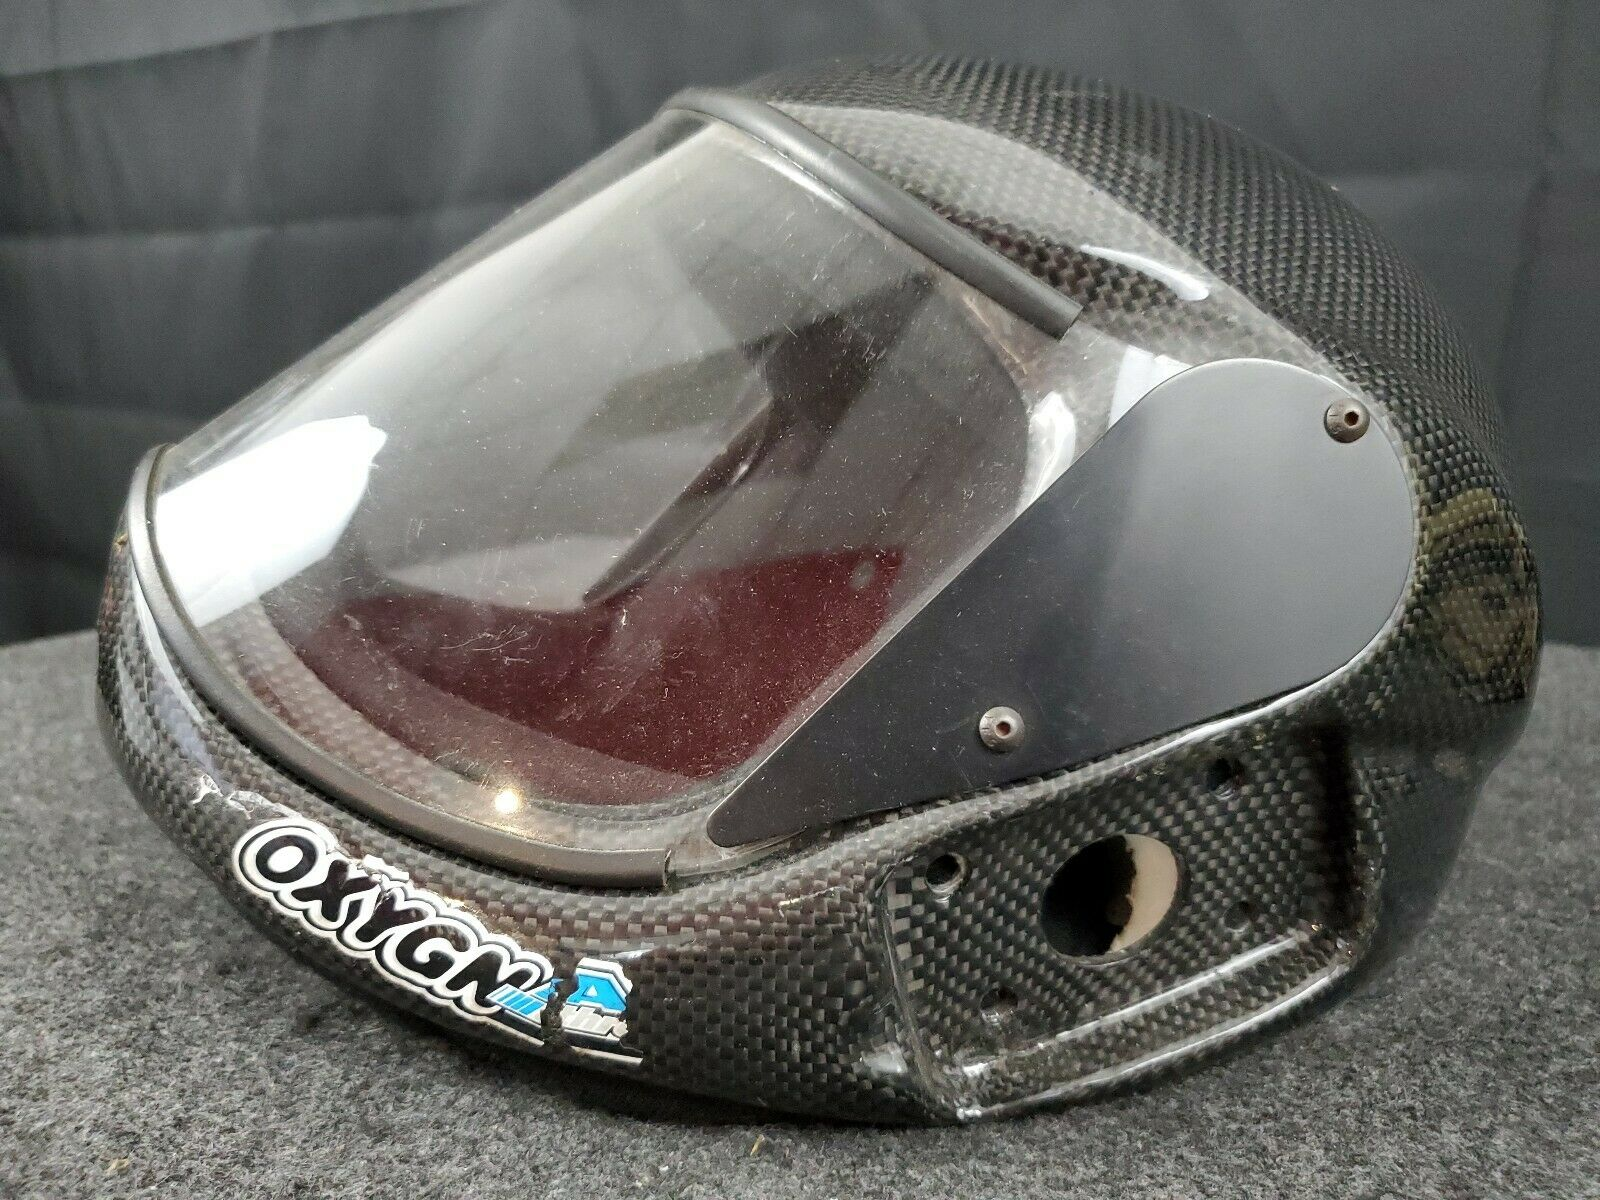 Sky Systems Oxygn A3 Skydiving Helmet, grand